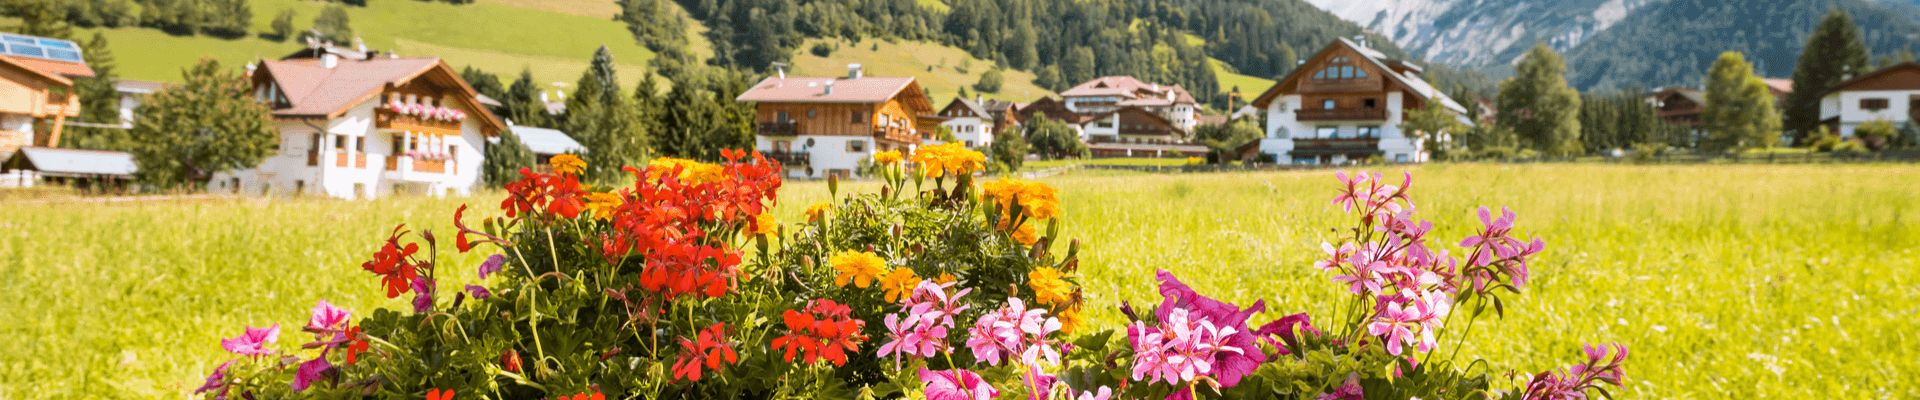 Wellnesshotels im Allgäu